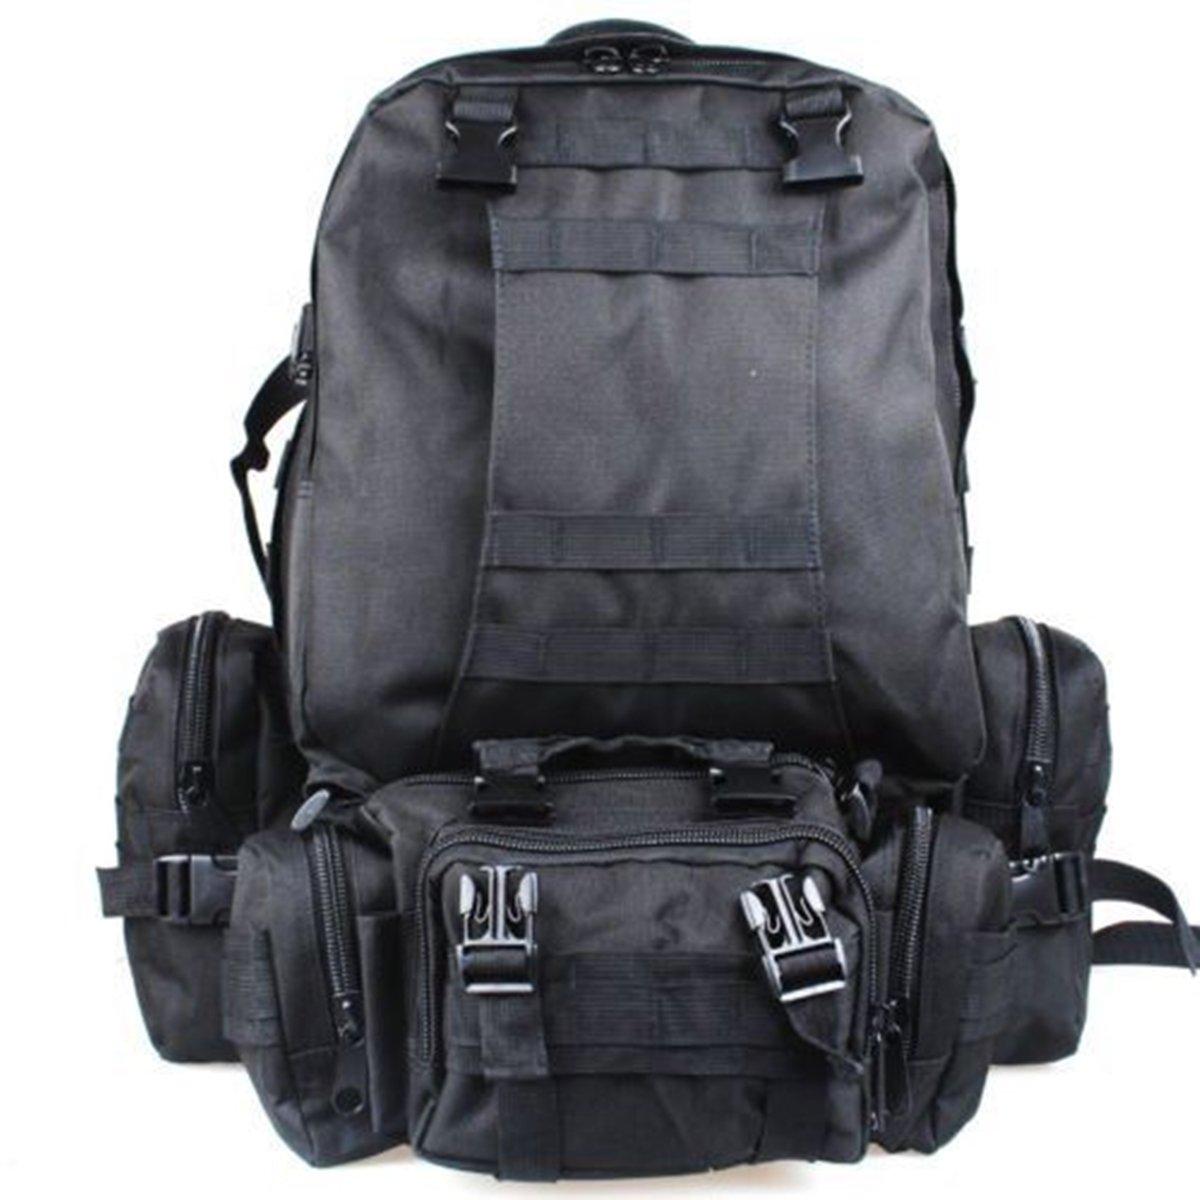 50L Outdoor Hiking Durable Bag Black Camping Travel Waterproof Mountaineering Backpack hot sale 2017